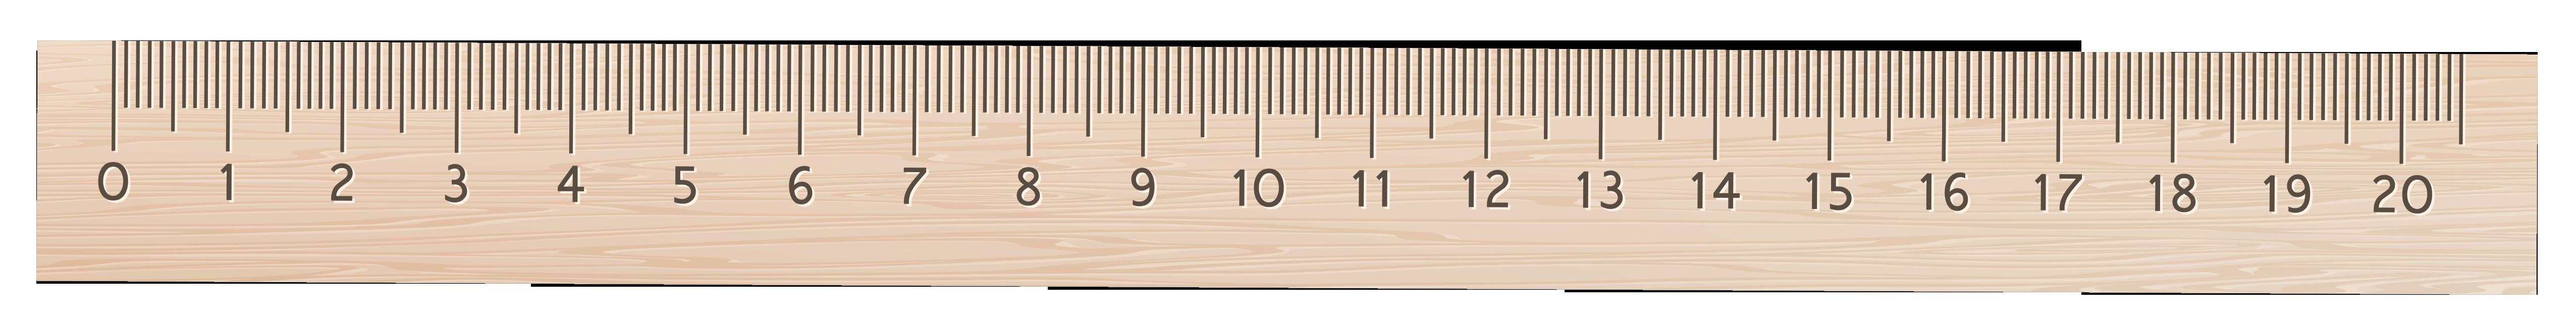 Png images free download. Clipart ruler wooden ruler